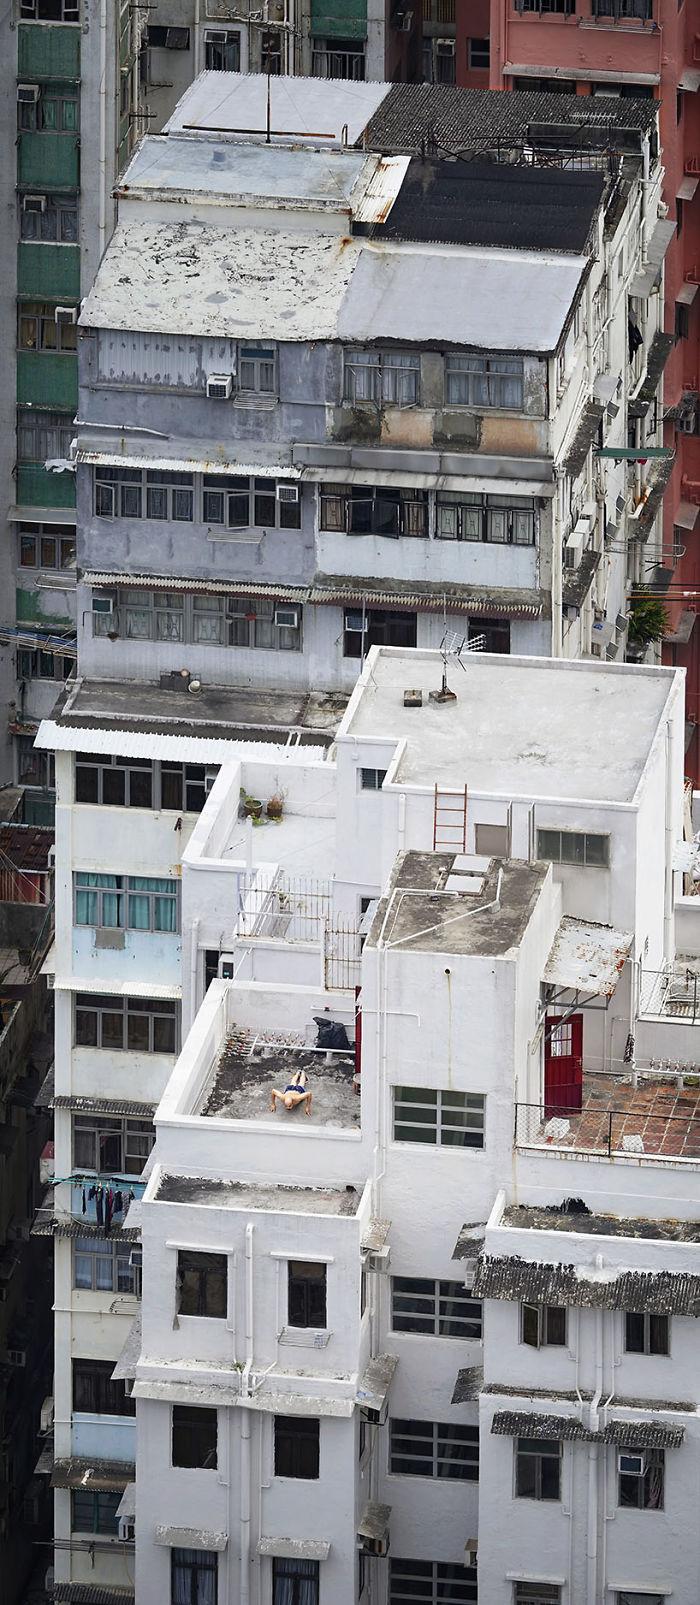 5ae2eb0b1ea30 Pushing Up 5adef90d676eb  700 - 12 coisas interessantes este fotógrafo capturado nos telhados de Hong Kong